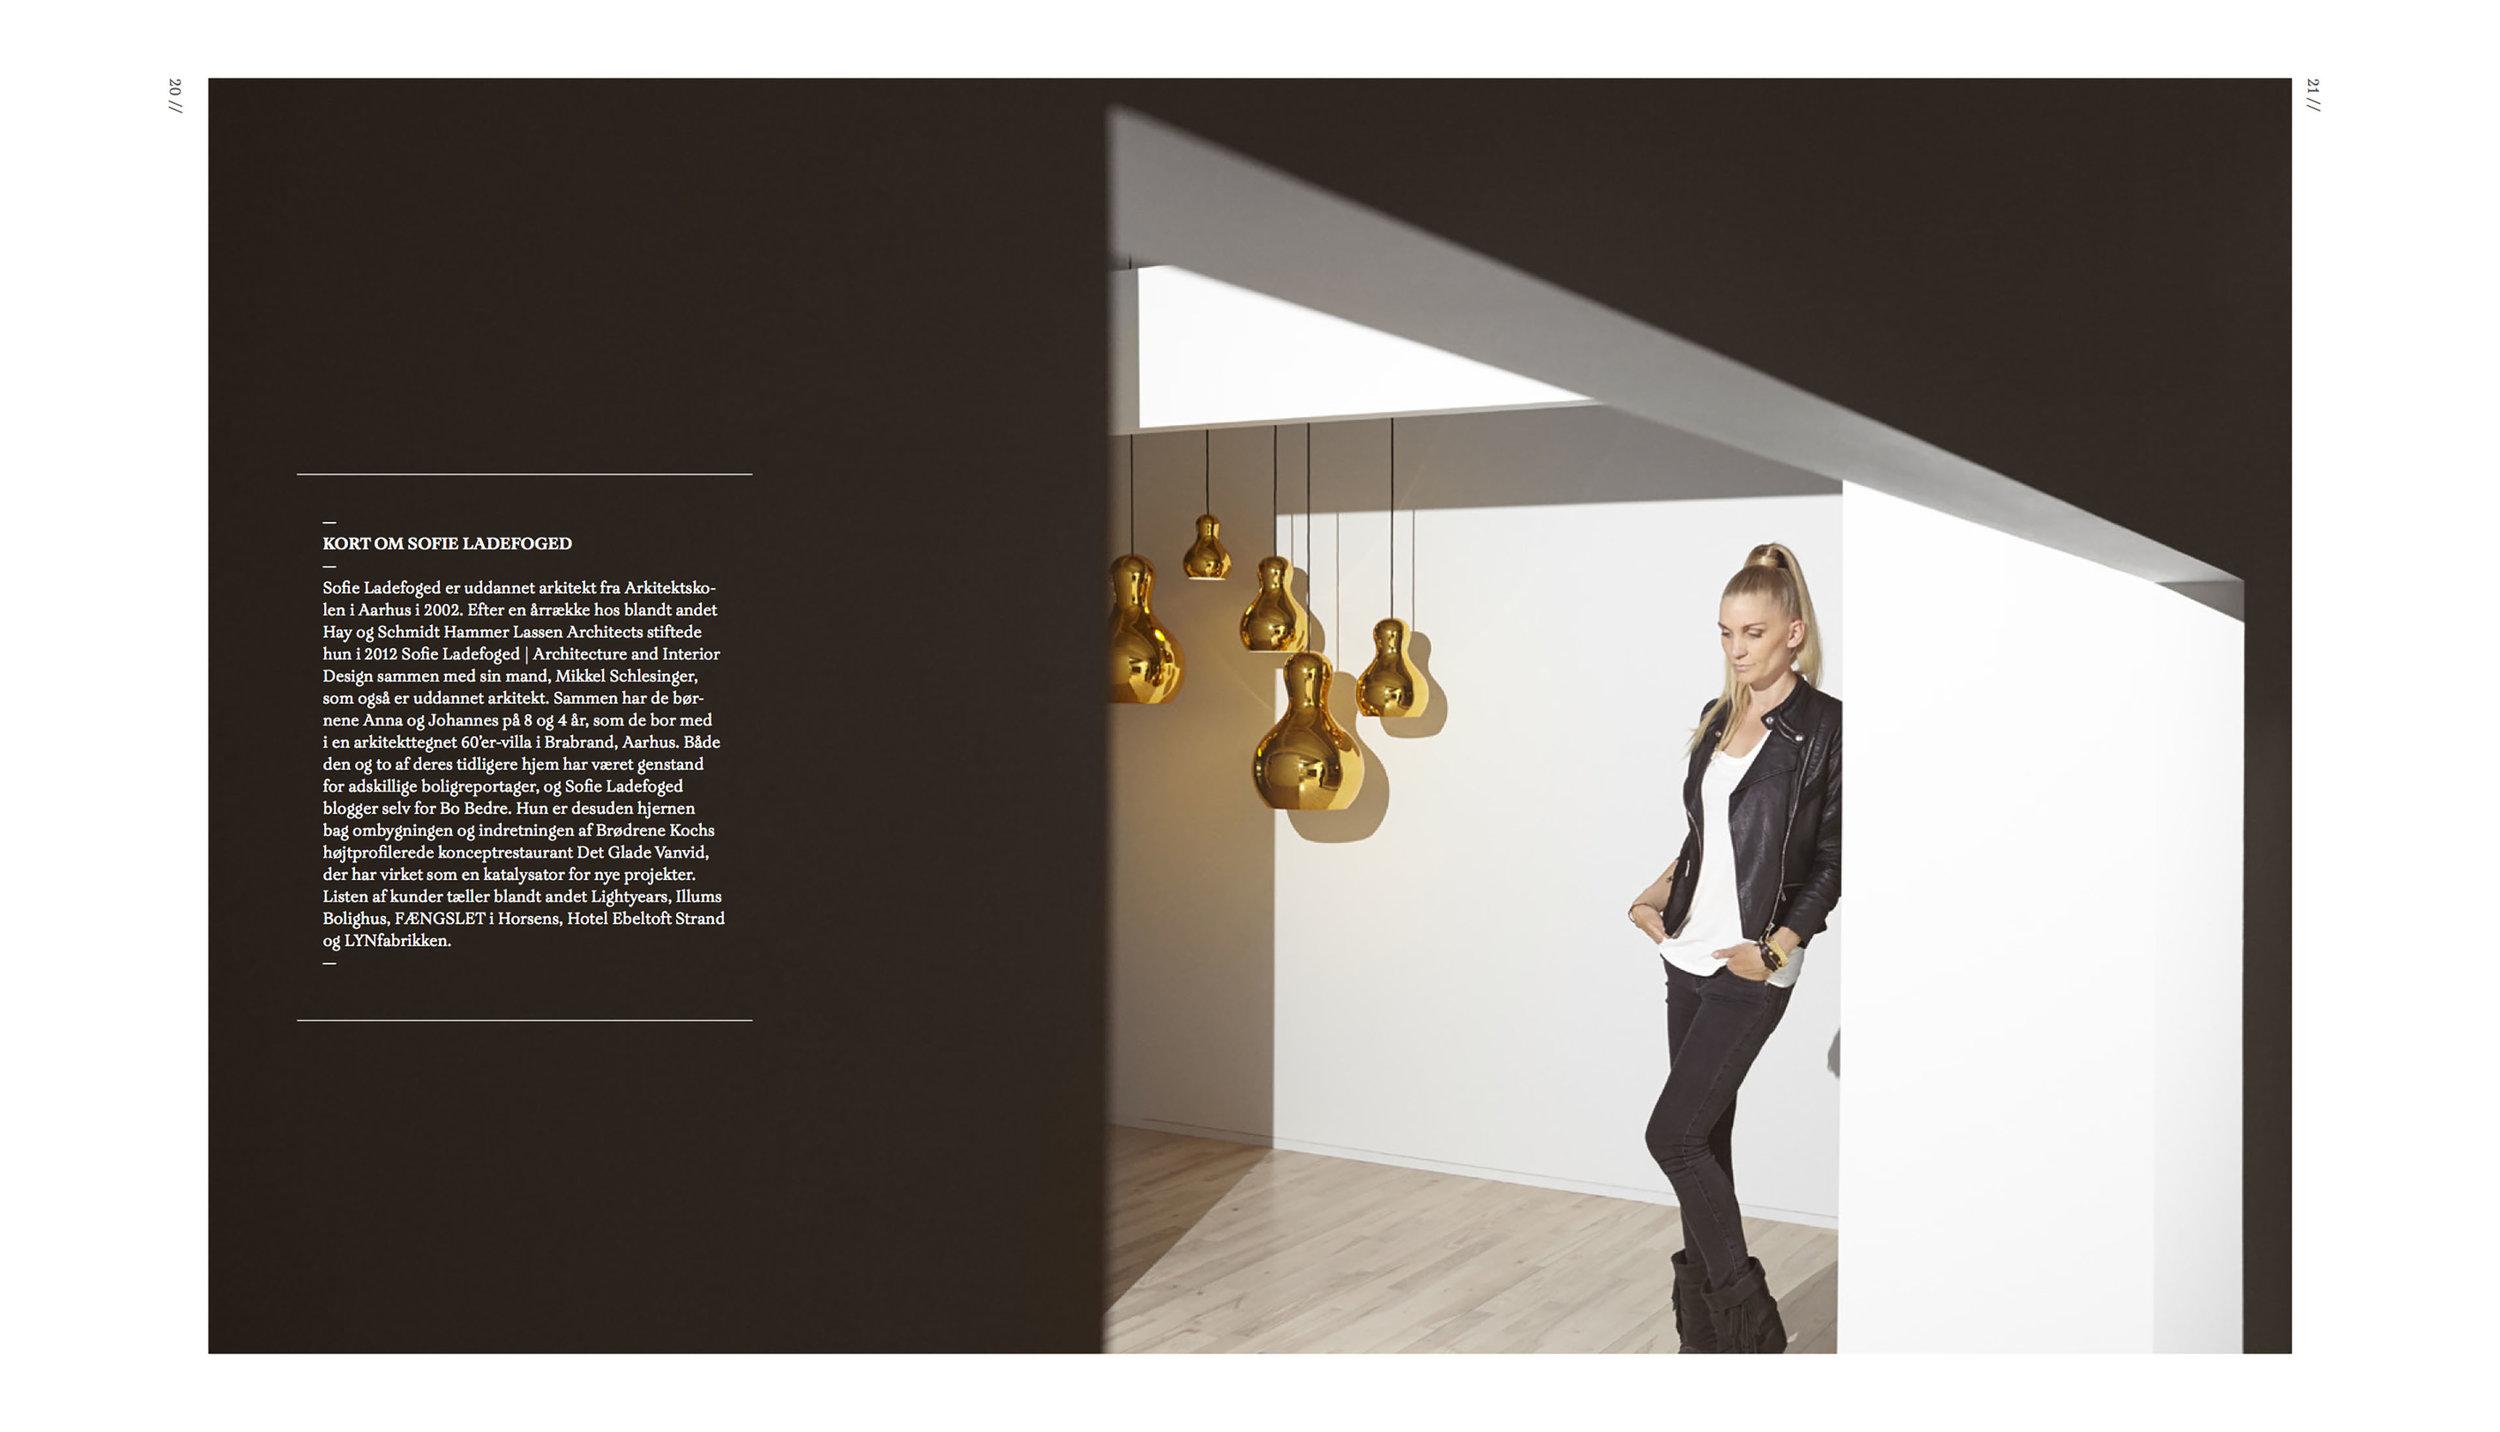 sofie-ladefoged-press-note-magazine-2014-page-05.jpg